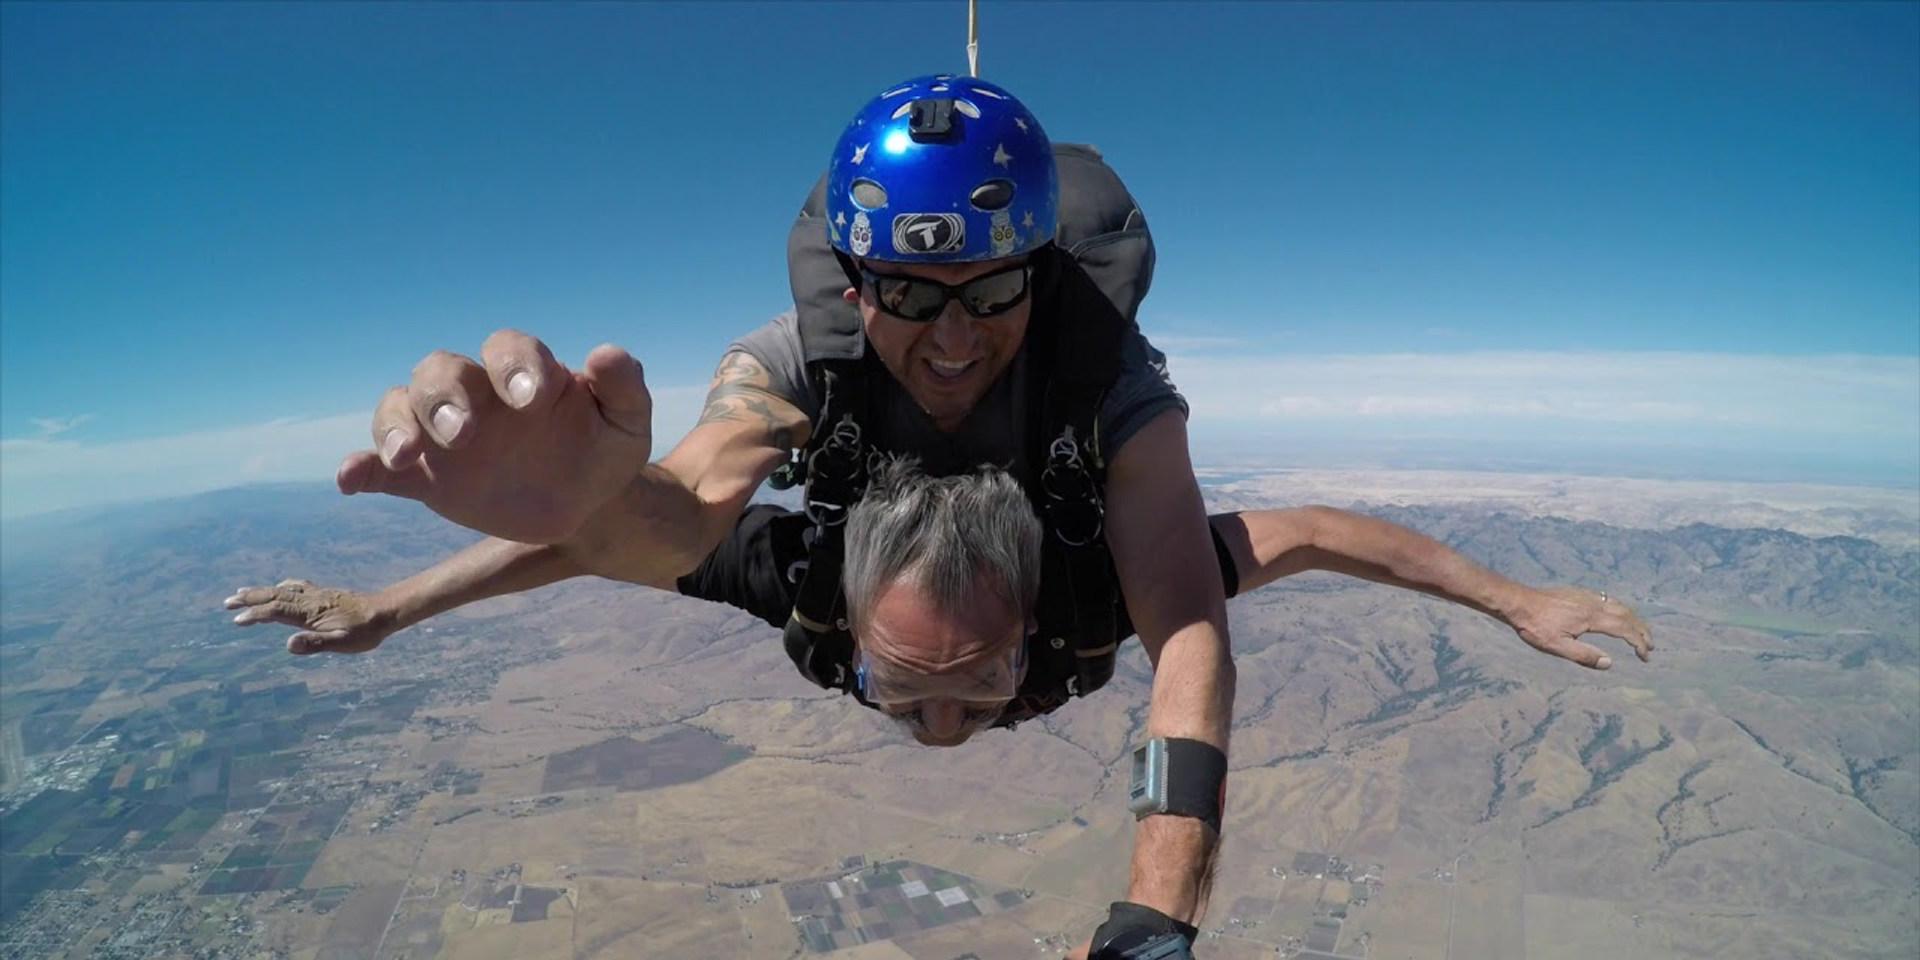 Oswaldo's June 2019 First Tandem Skydive in Hollister